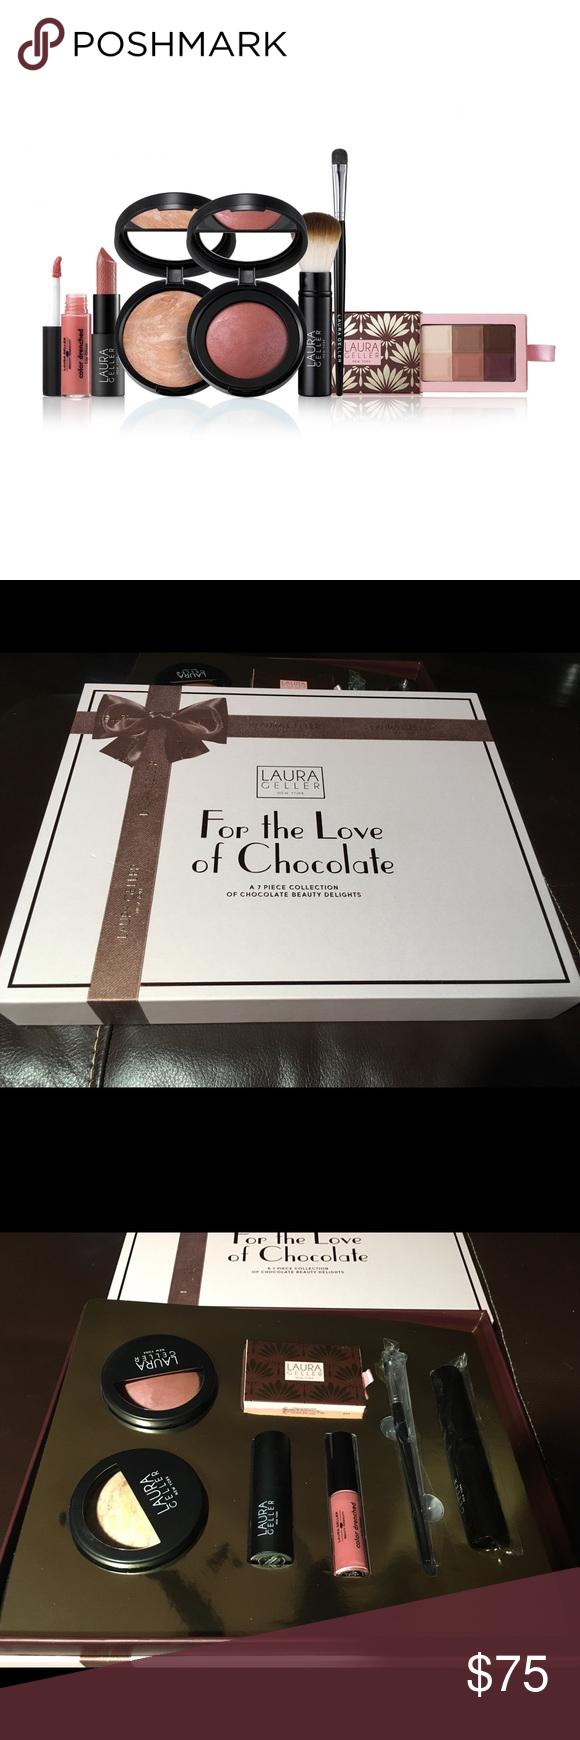 Laura Geller For The Love of Chocolate (NIB) NWT Laura